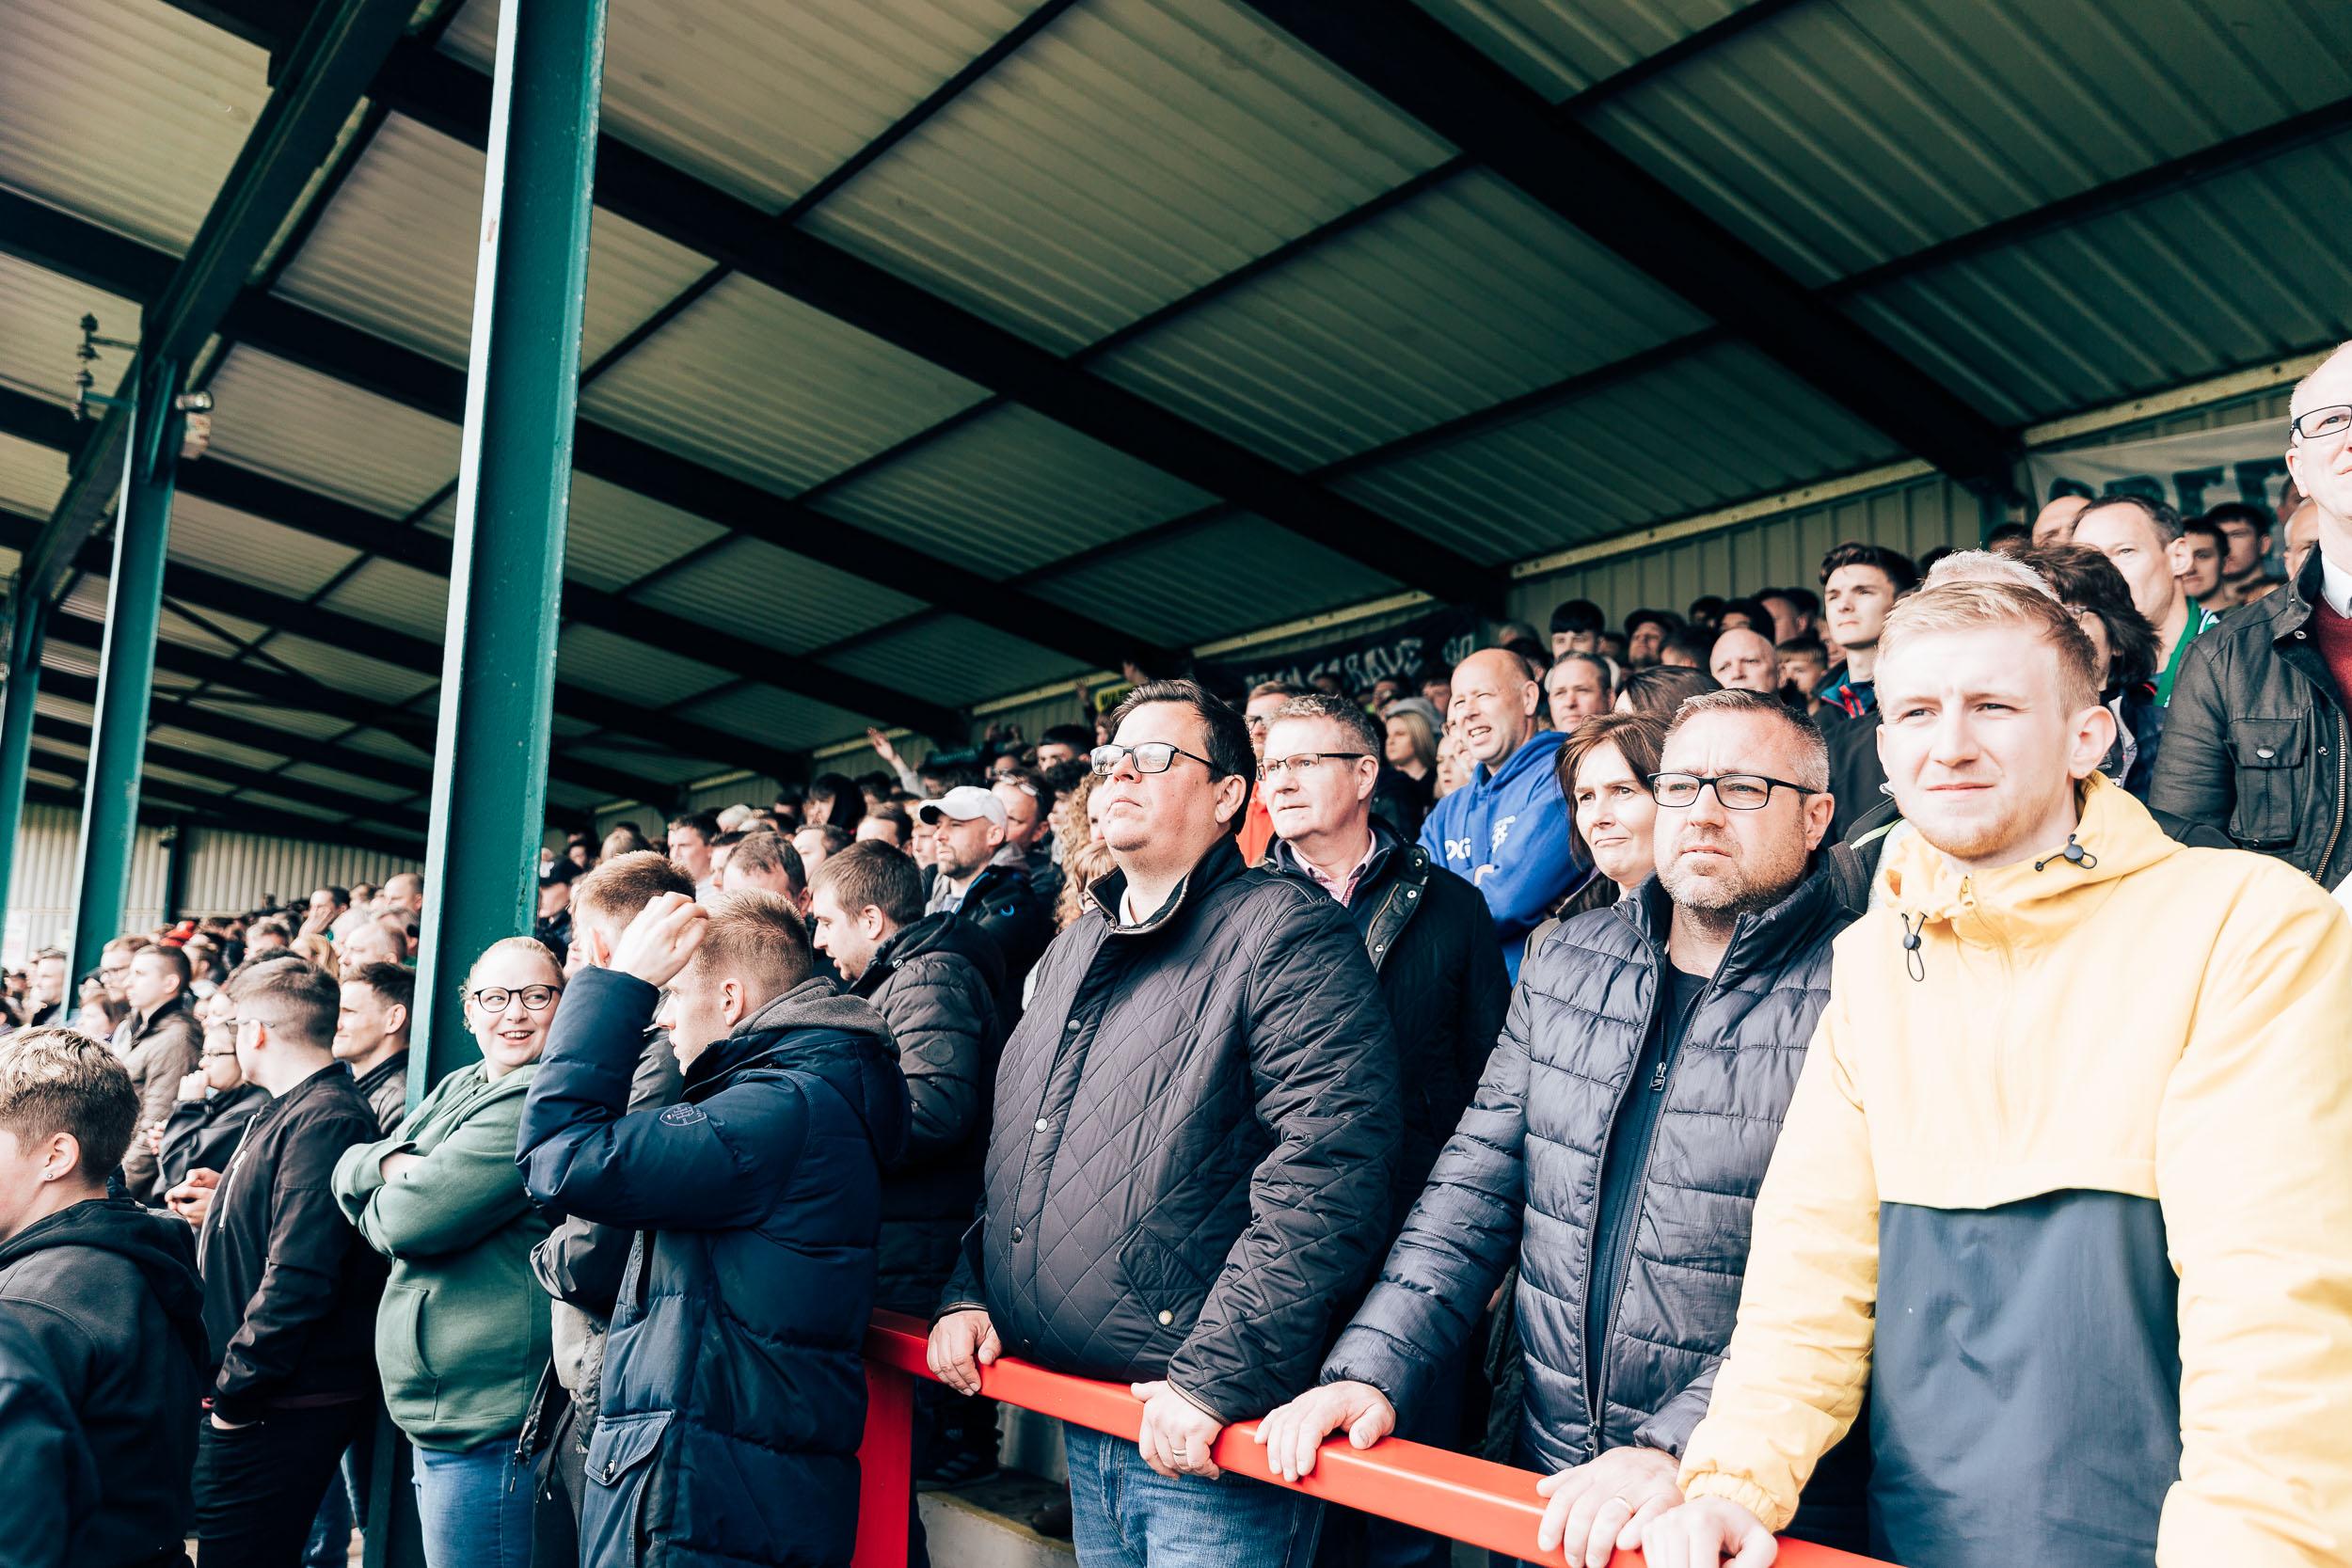 06_05_2019_Bromsgrove_Sporting_Corby-168.jpg